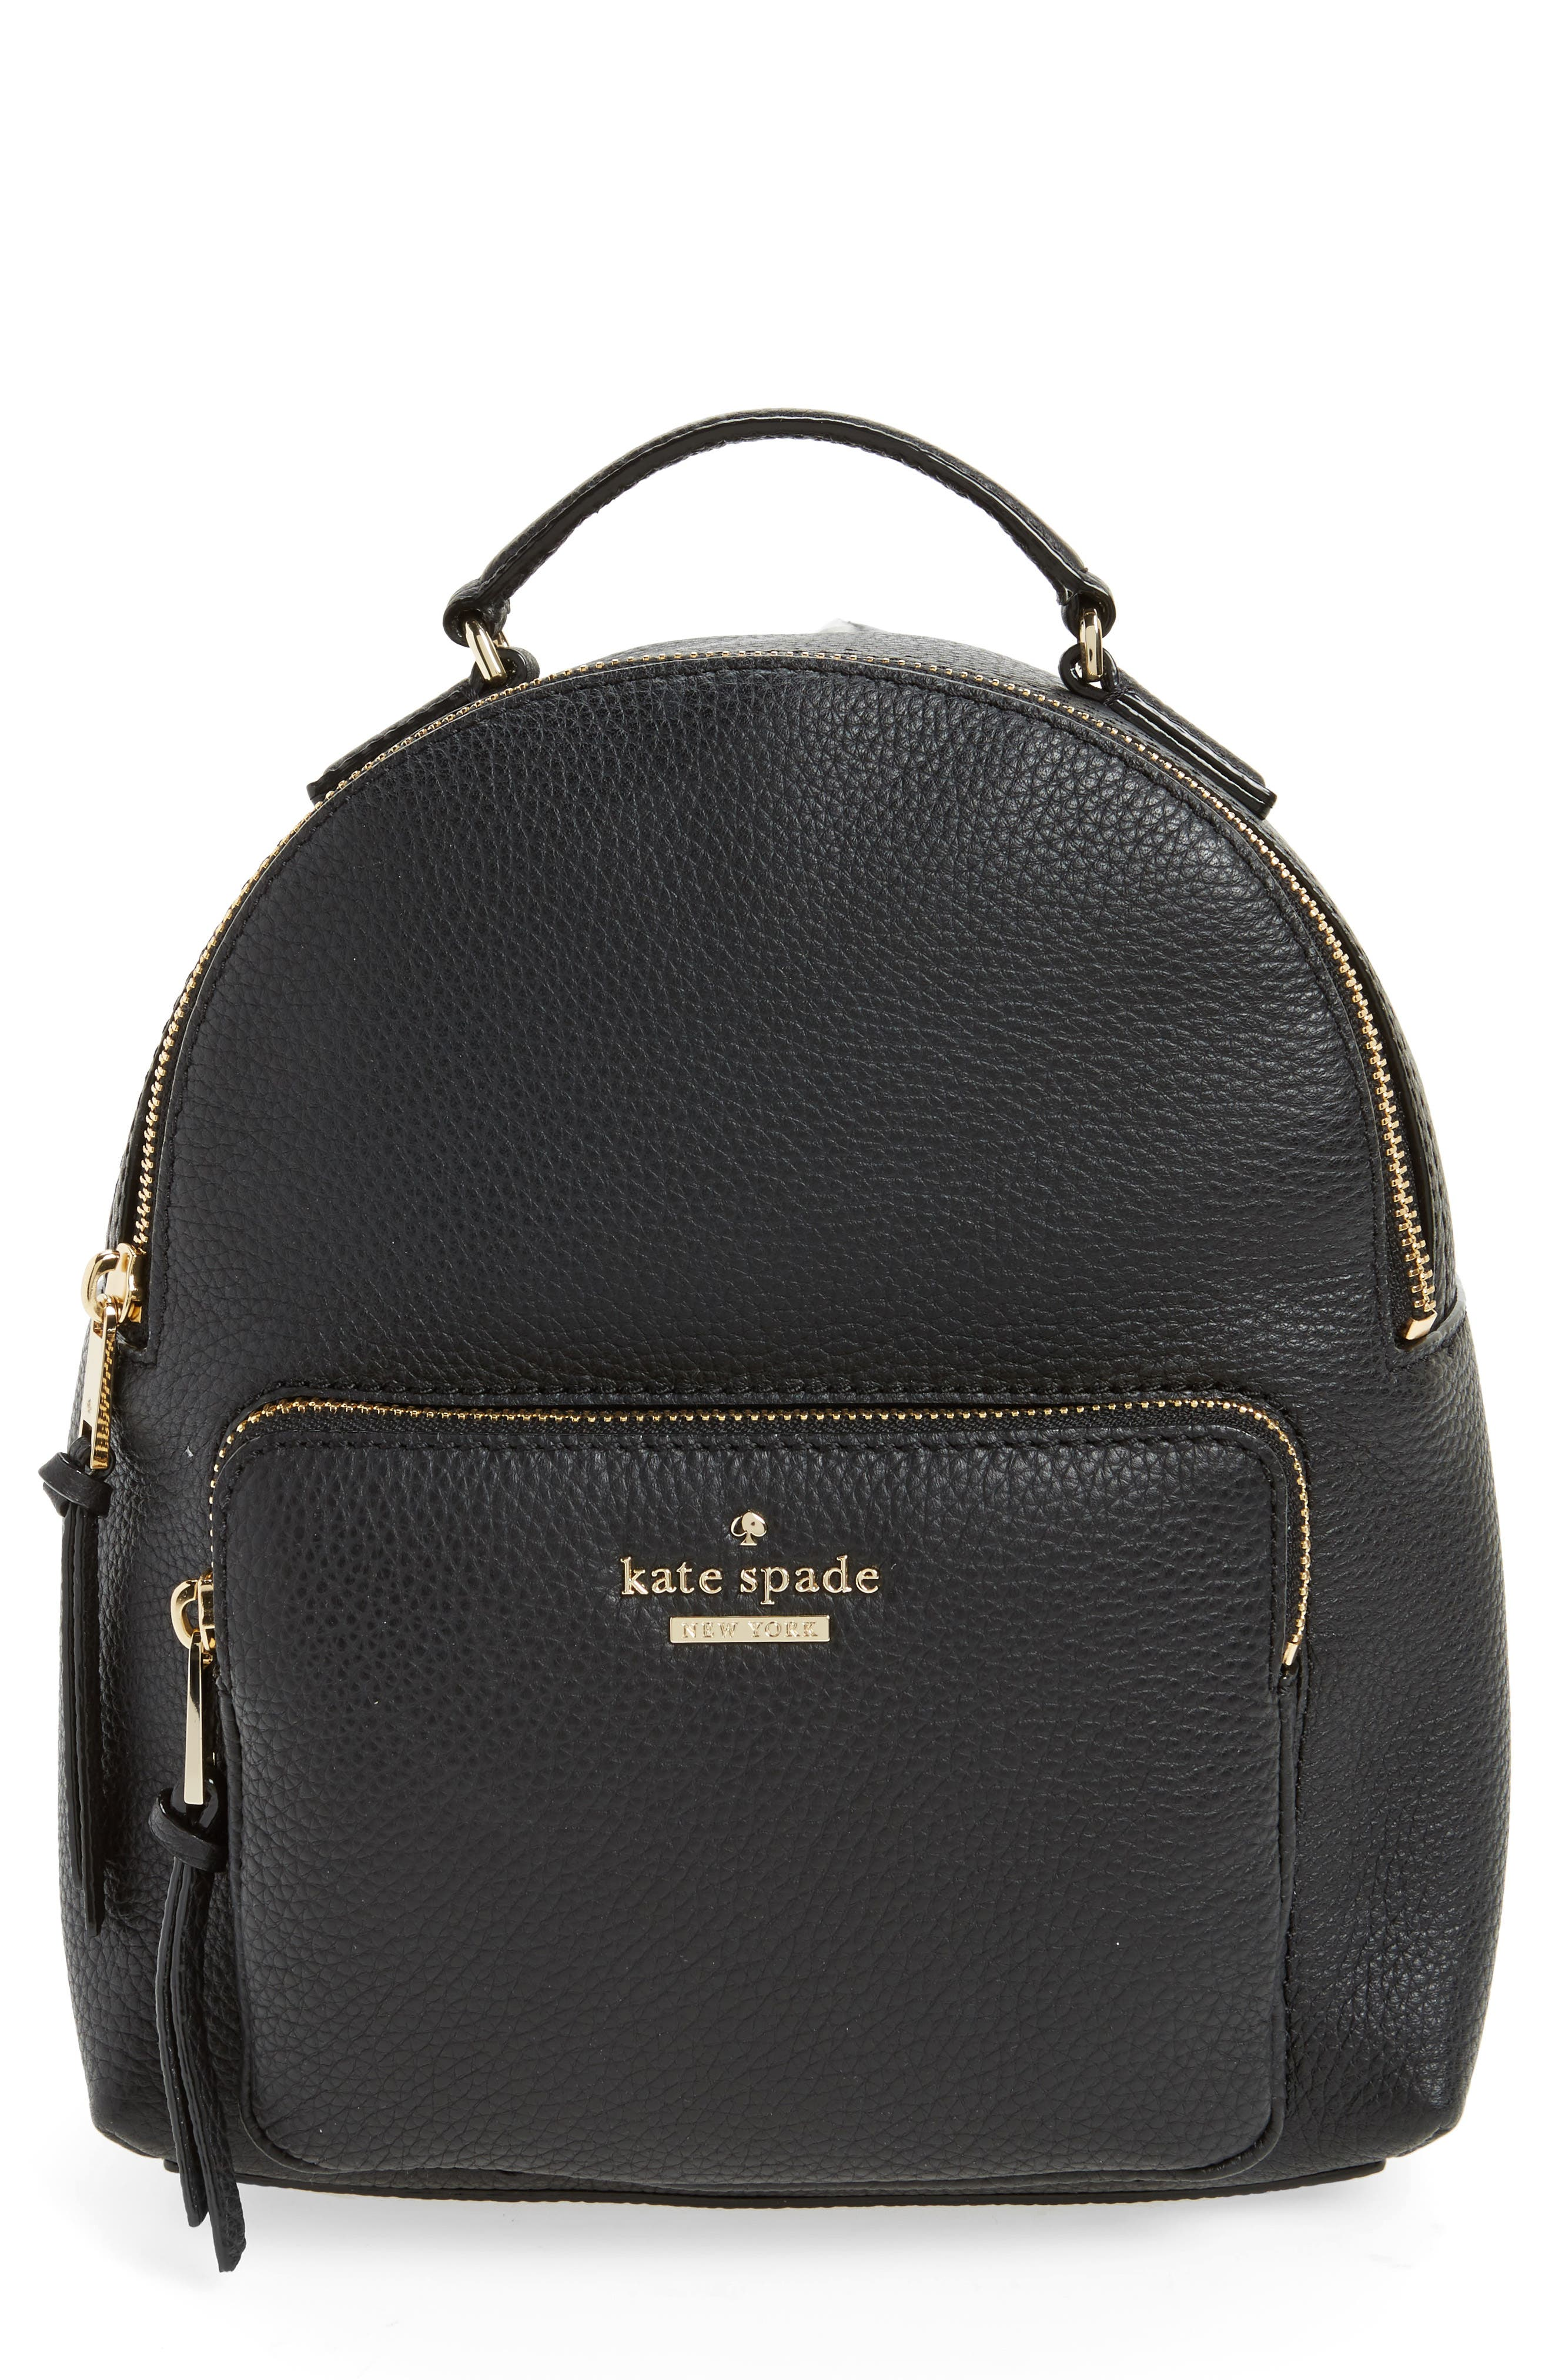 KATE SPADE NEW YORK jackson street - keleigh leather backpack, Main, color, 001